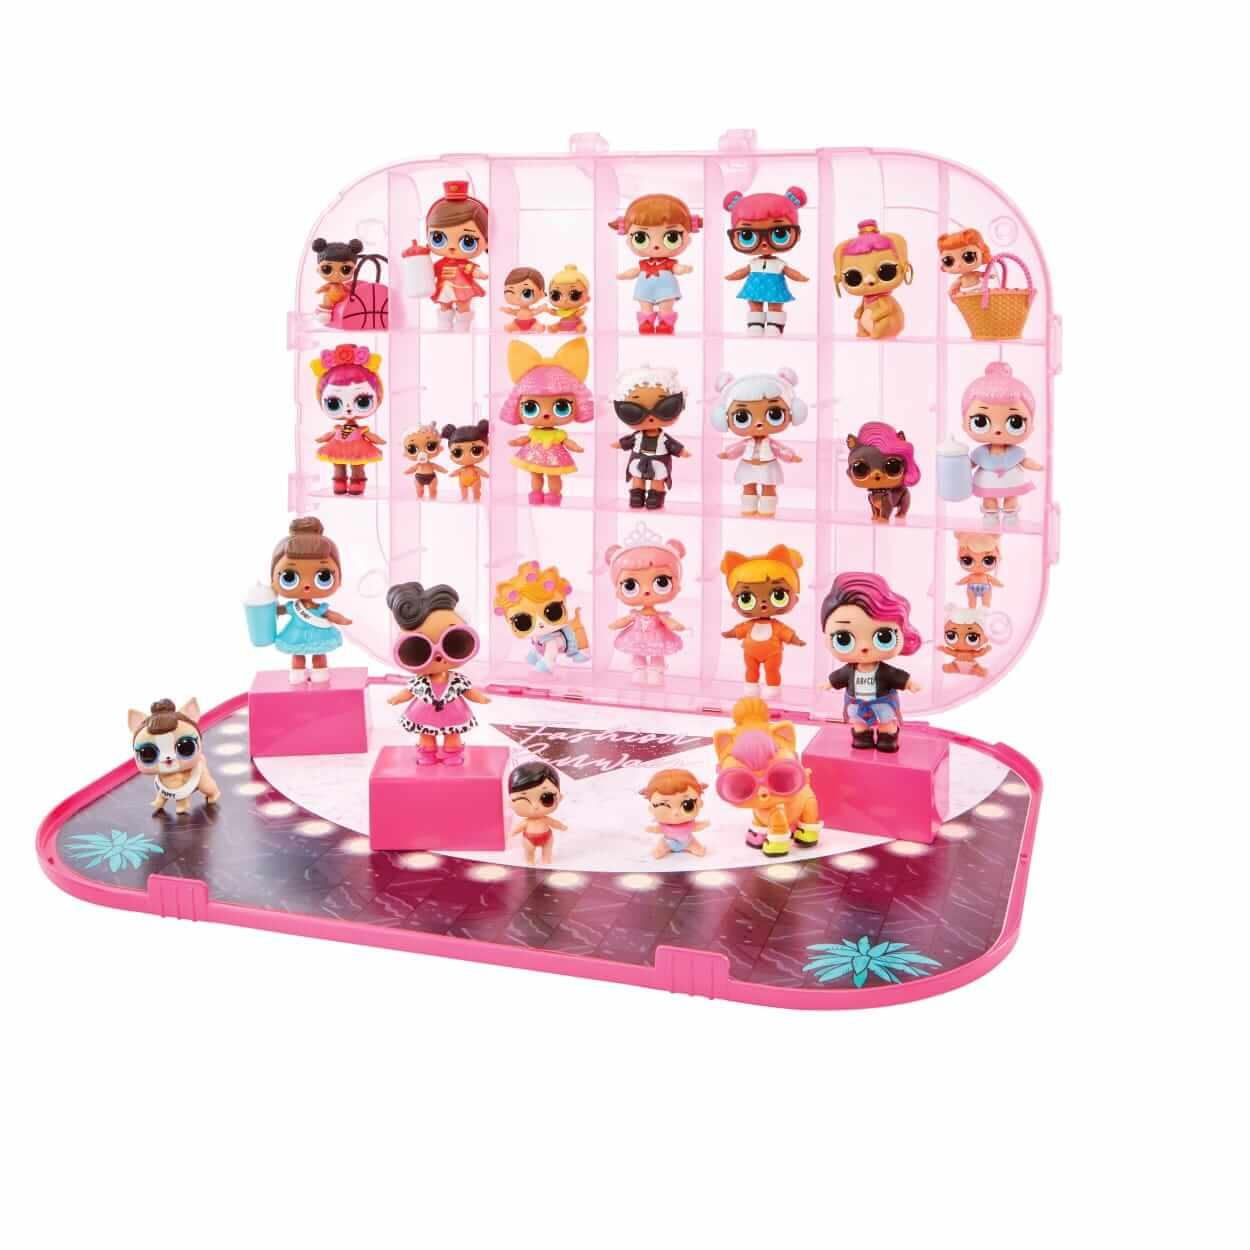 L.O.L. Surprise Fashion Show On-The-Go Hot Pink Storage & Playset. Кейс для хранения кукол ЛОЛ